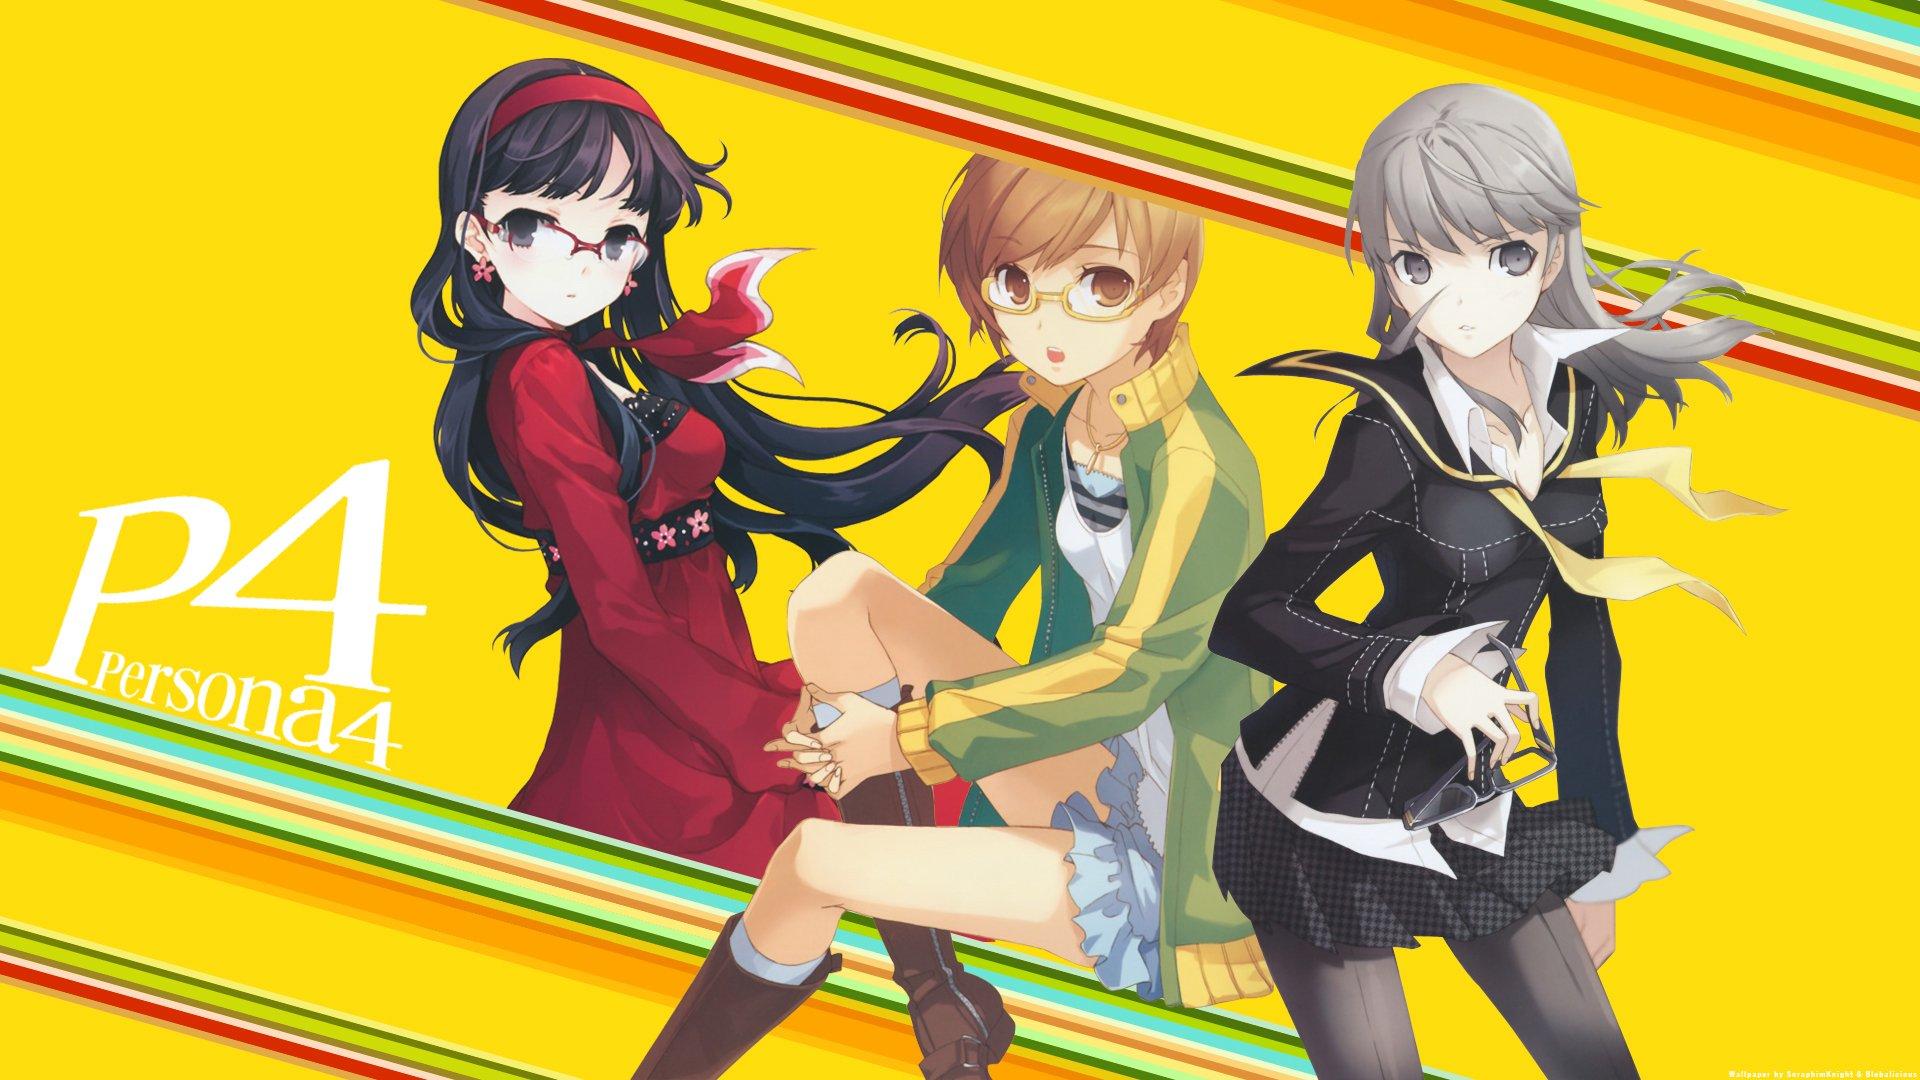 Persona 4 Cute Chie Wallpaper Persona 4 Hd Wallpaper Background Image 1920x1080 Id